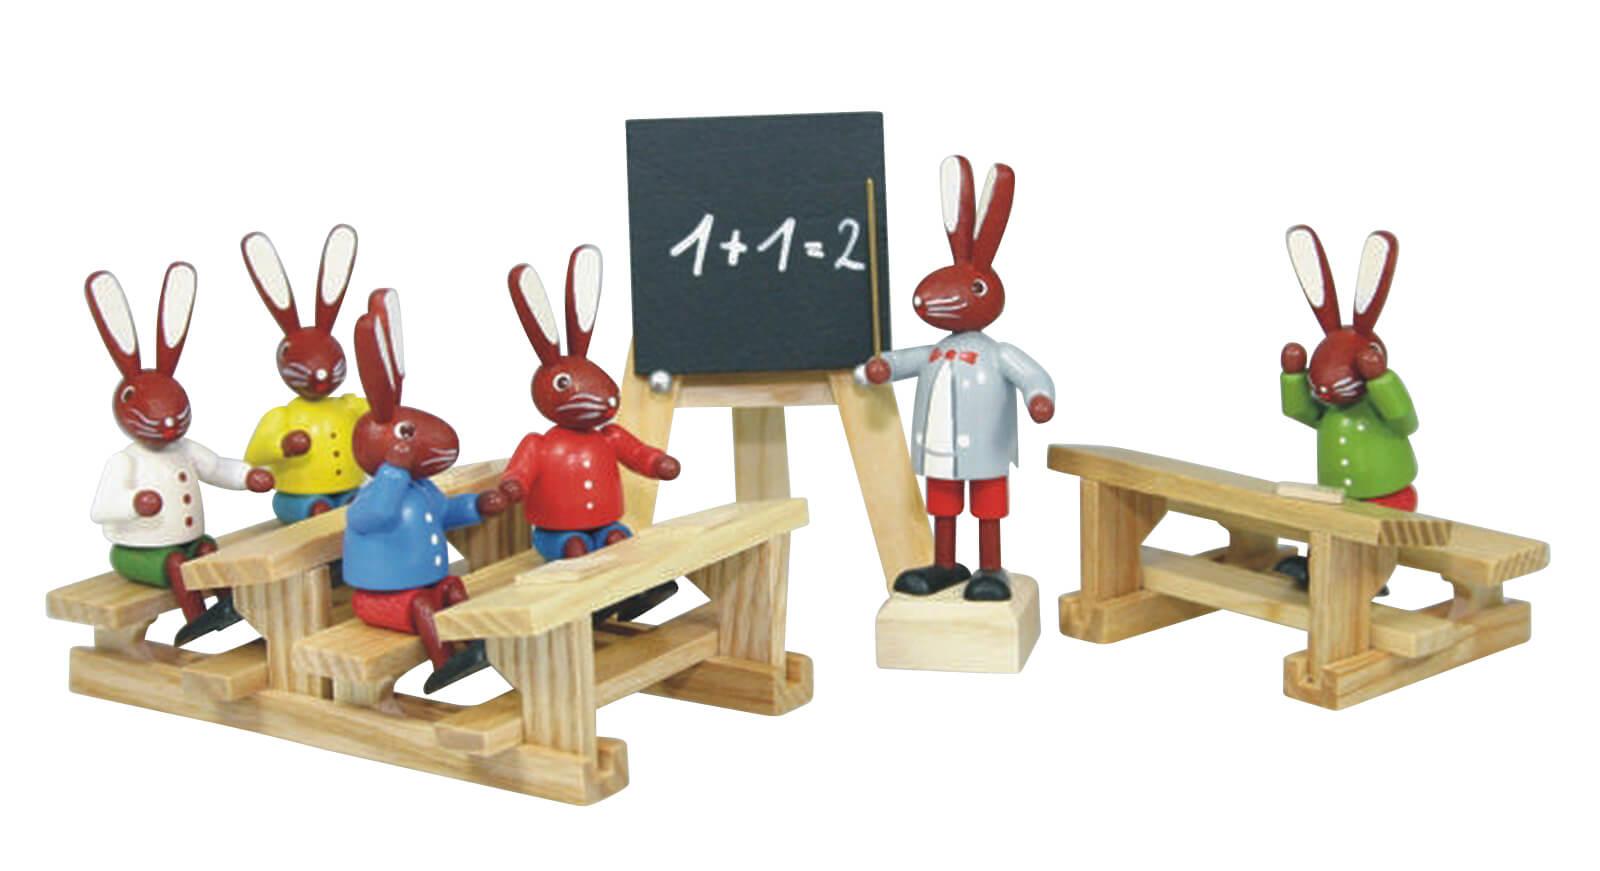 Osterhasenschule (5 Hasenschüler, 1 Lehrer, 2 Bänke (lang + kurz), 1 Tafel), bunt, 6 cm von Stephan Kaden holz.kunst Seiffen/Erzgebirge